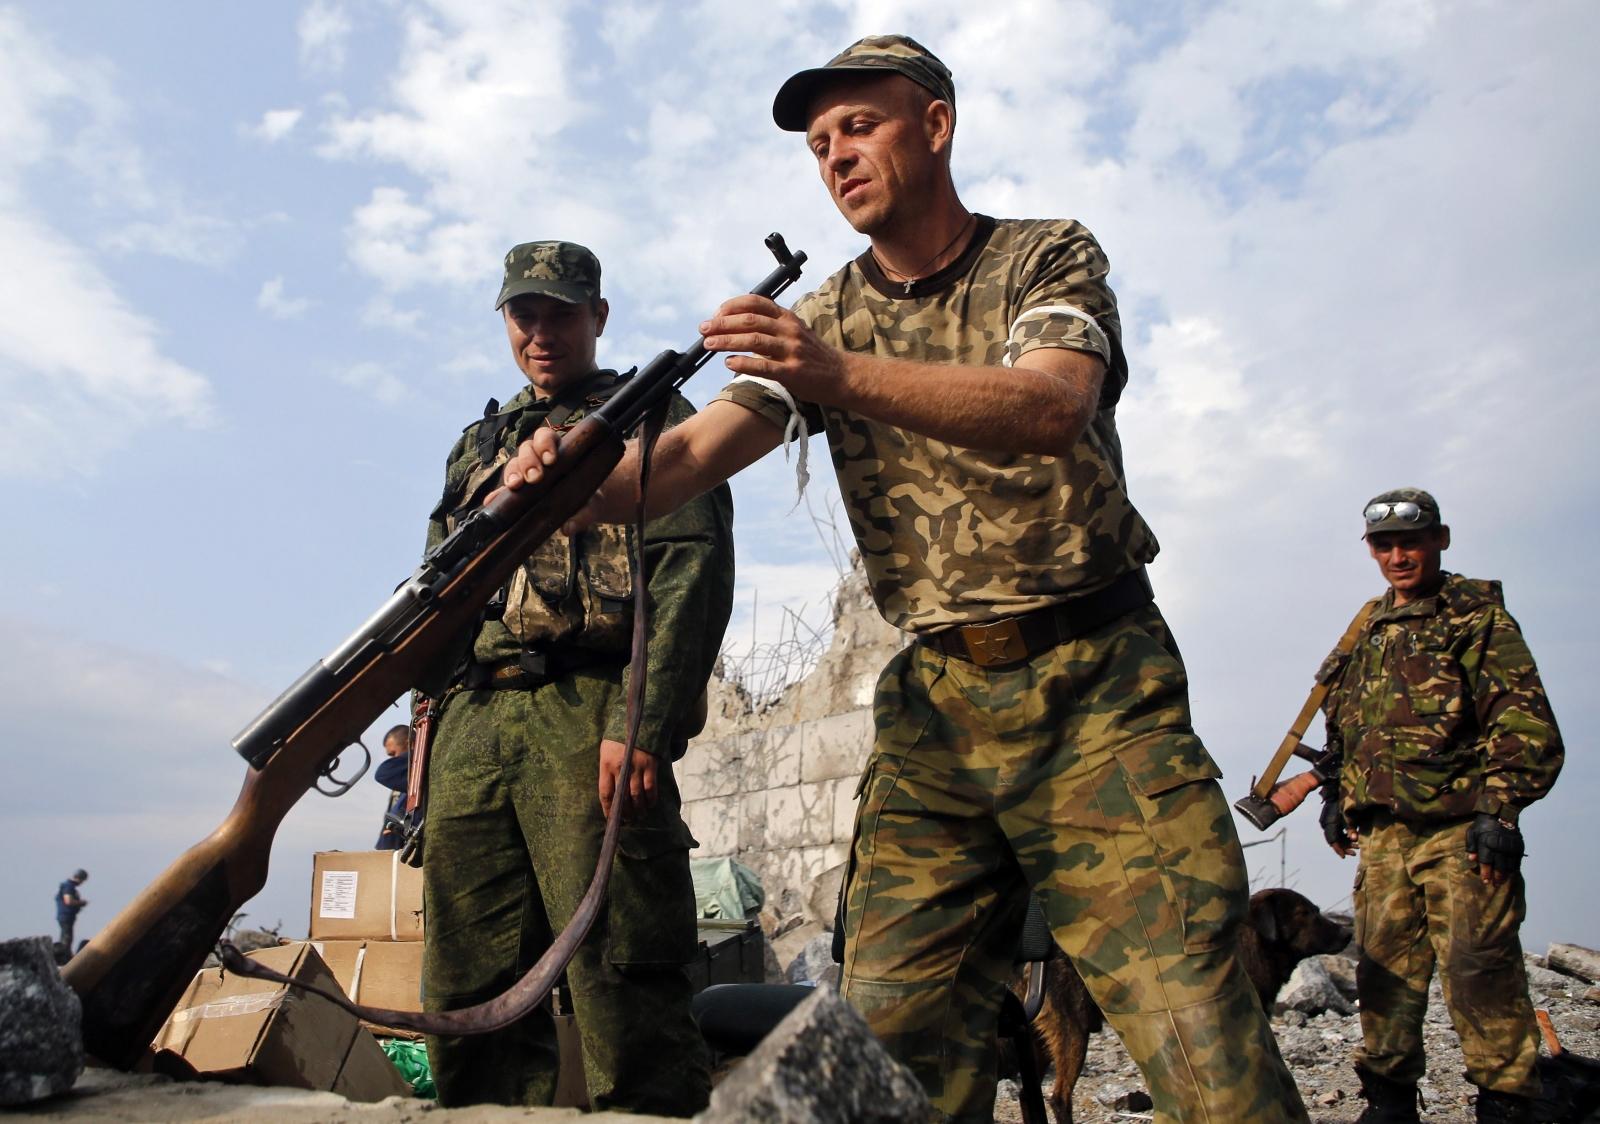 Russia Begins 'Full-Scale Invasion' of Ukraine as World Leaders Scramble